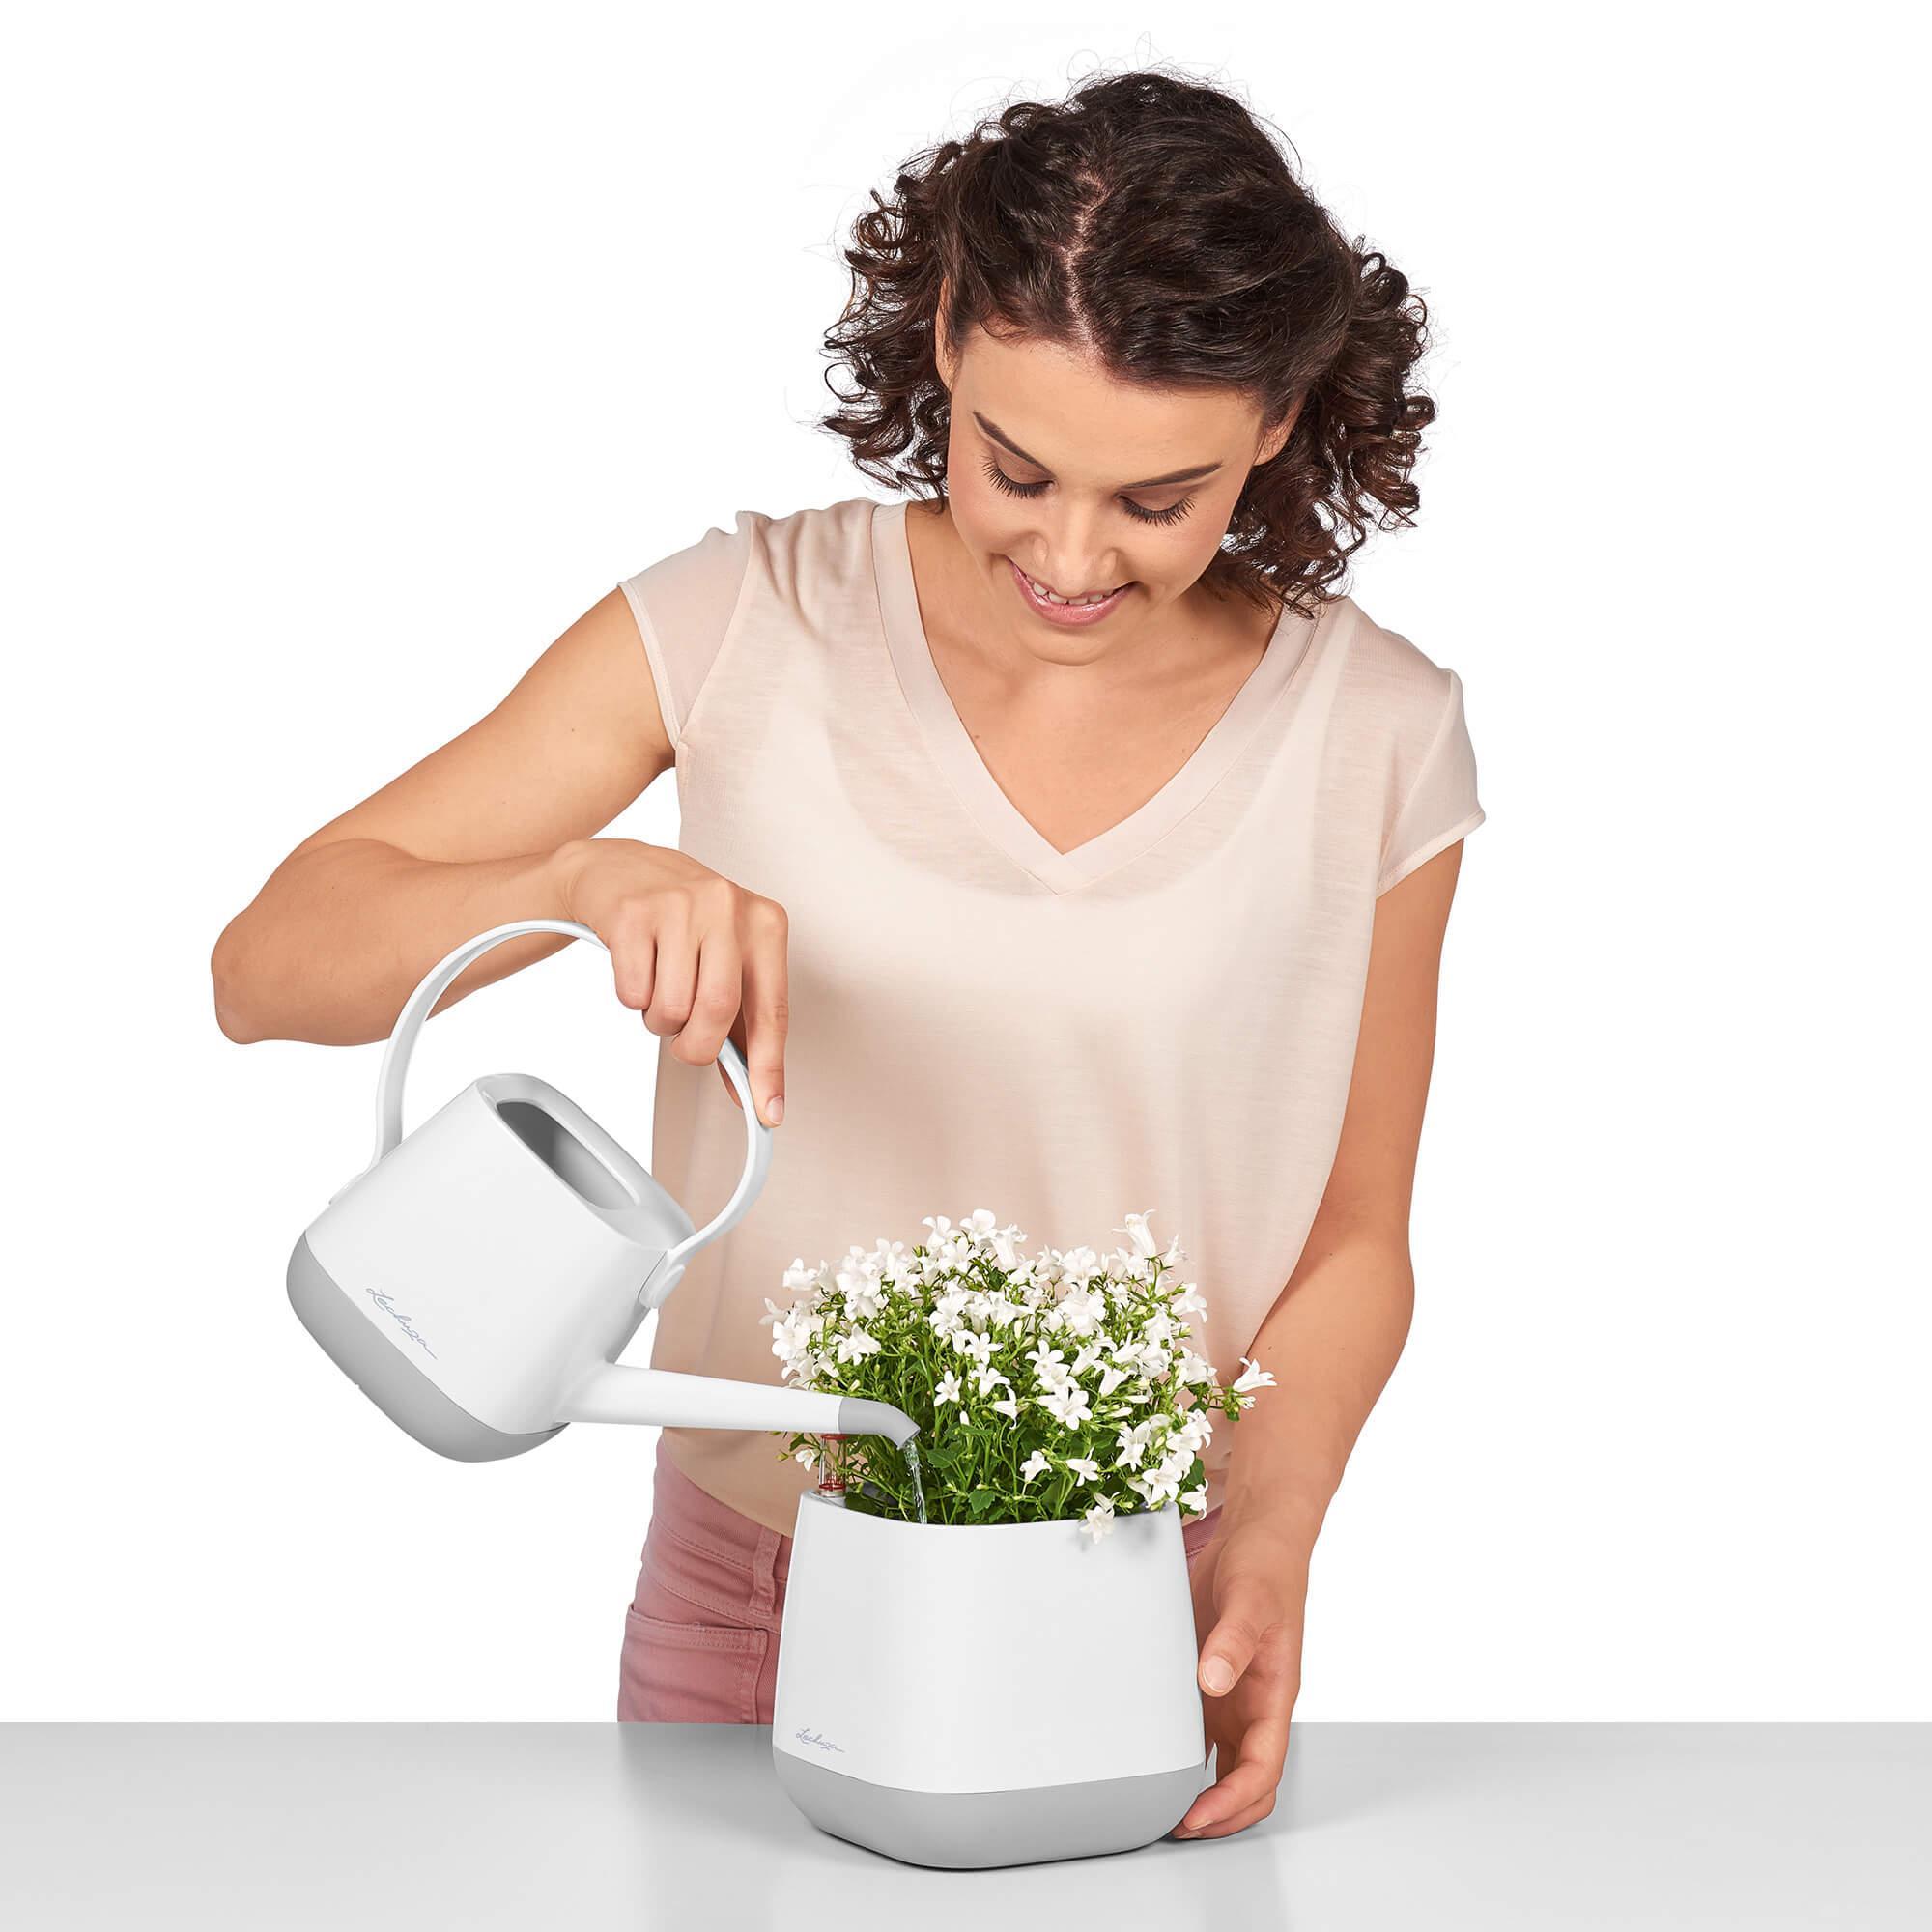 YULA planter white/gray semi-gloss - Image 11